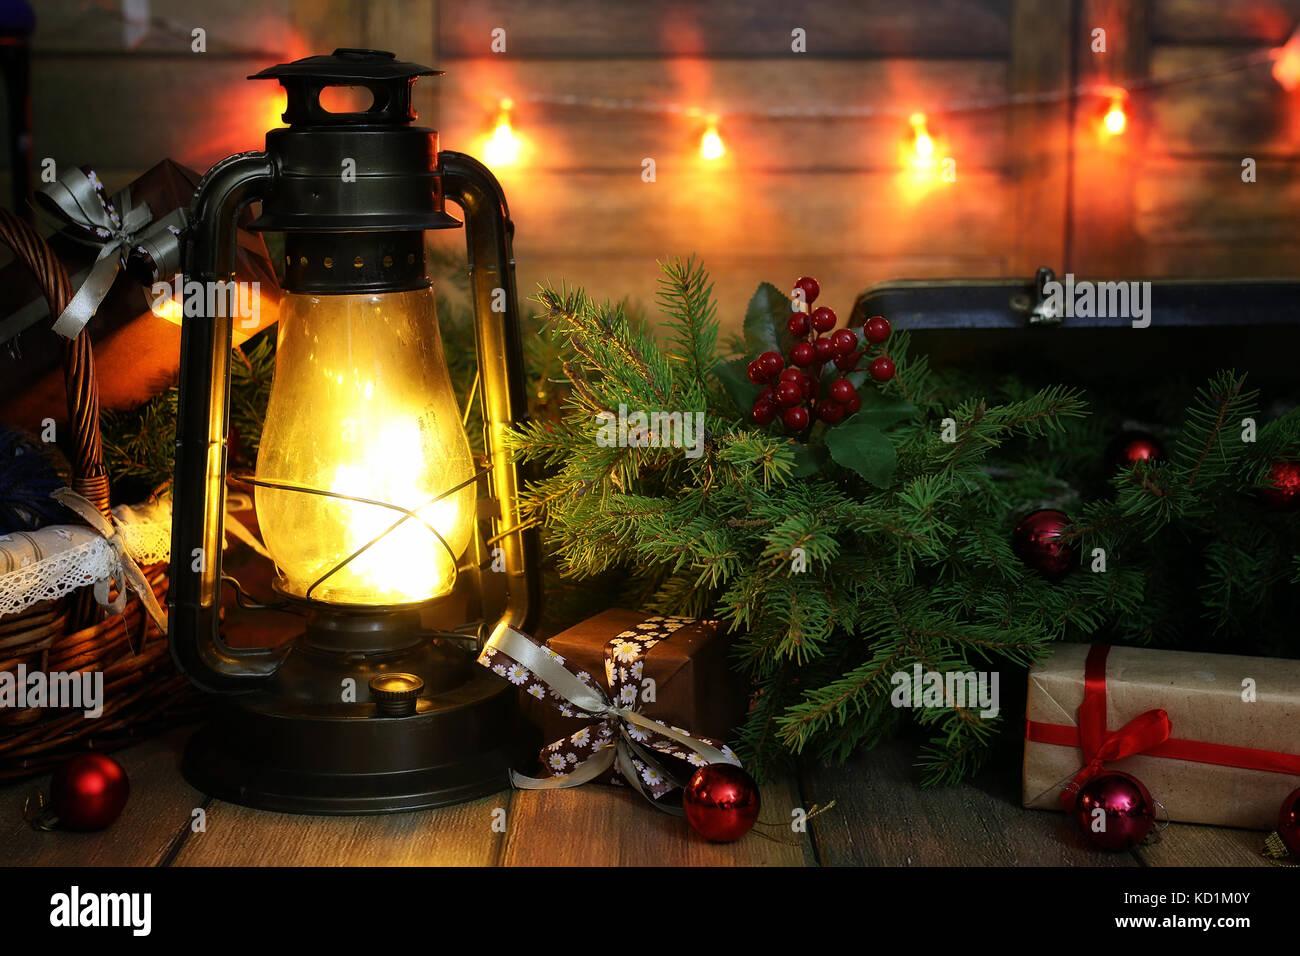 christmas balls fir branch burning candles gift stockfotos christmas balls fir branch burning. Black Bedroom Furniture Sets. Home Design Ideas